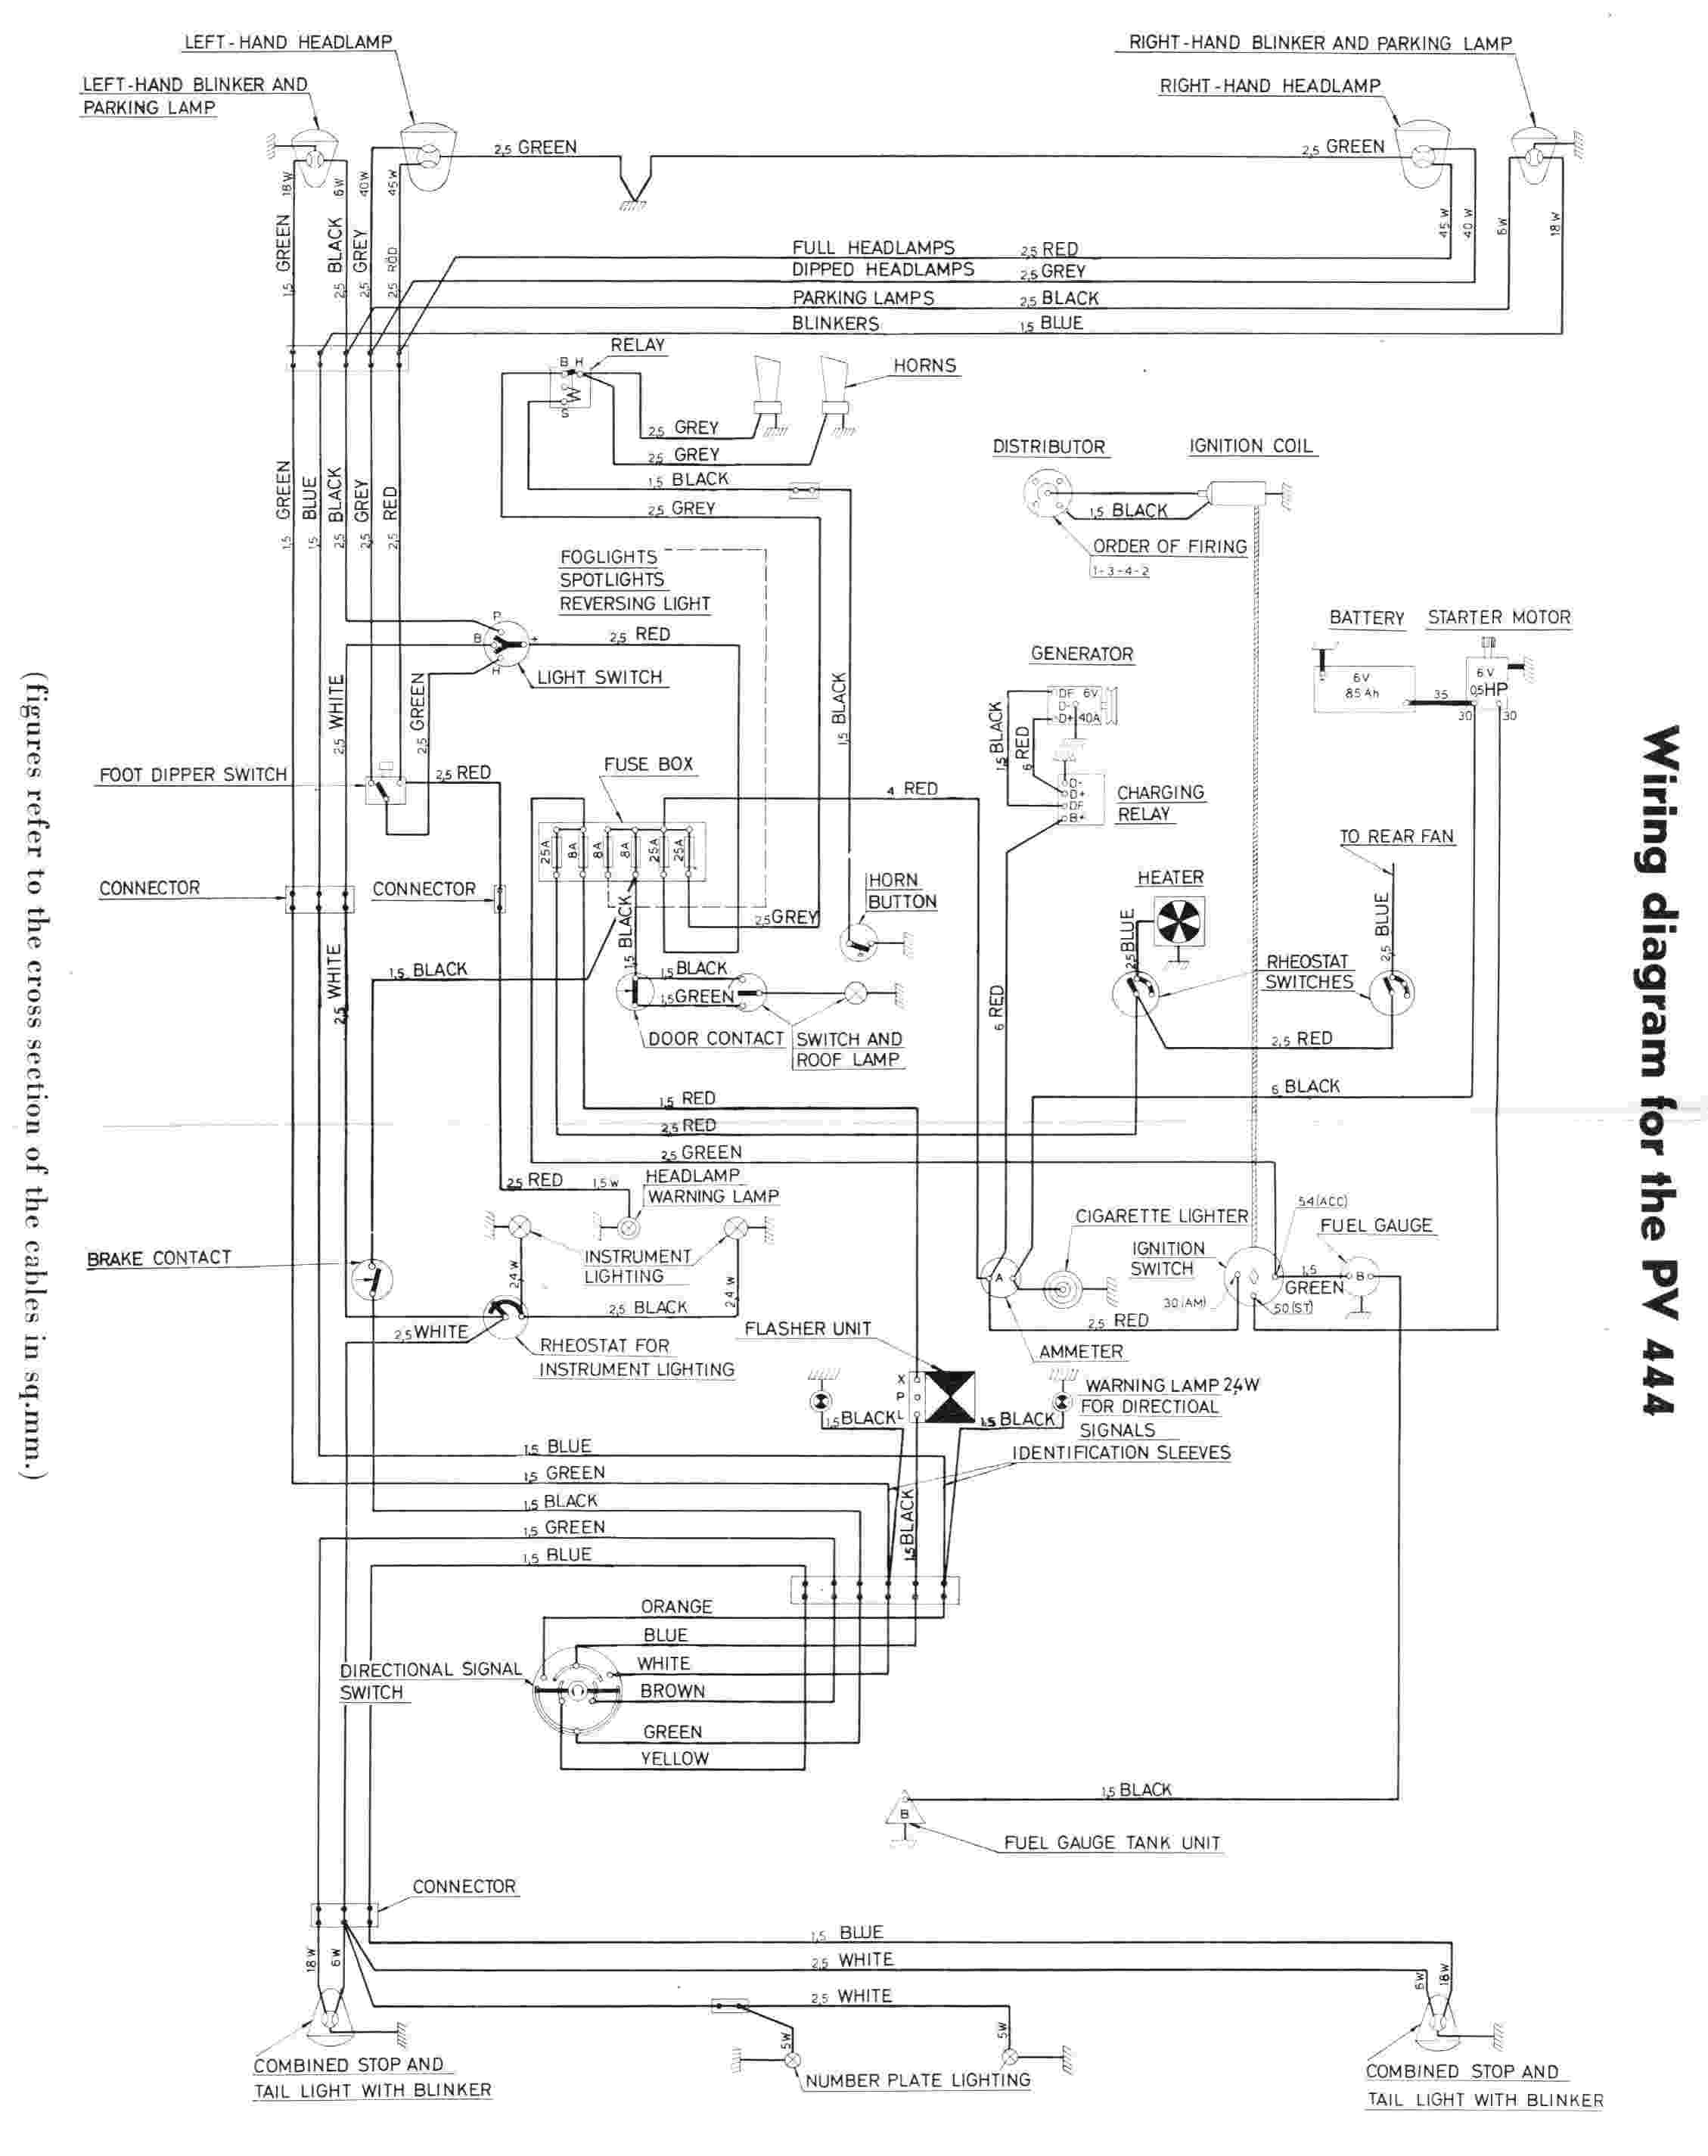 Volvo Truck Wiring Diagrams Free Download Diagram Libraries Engine Semi Dash Todays2012 Box